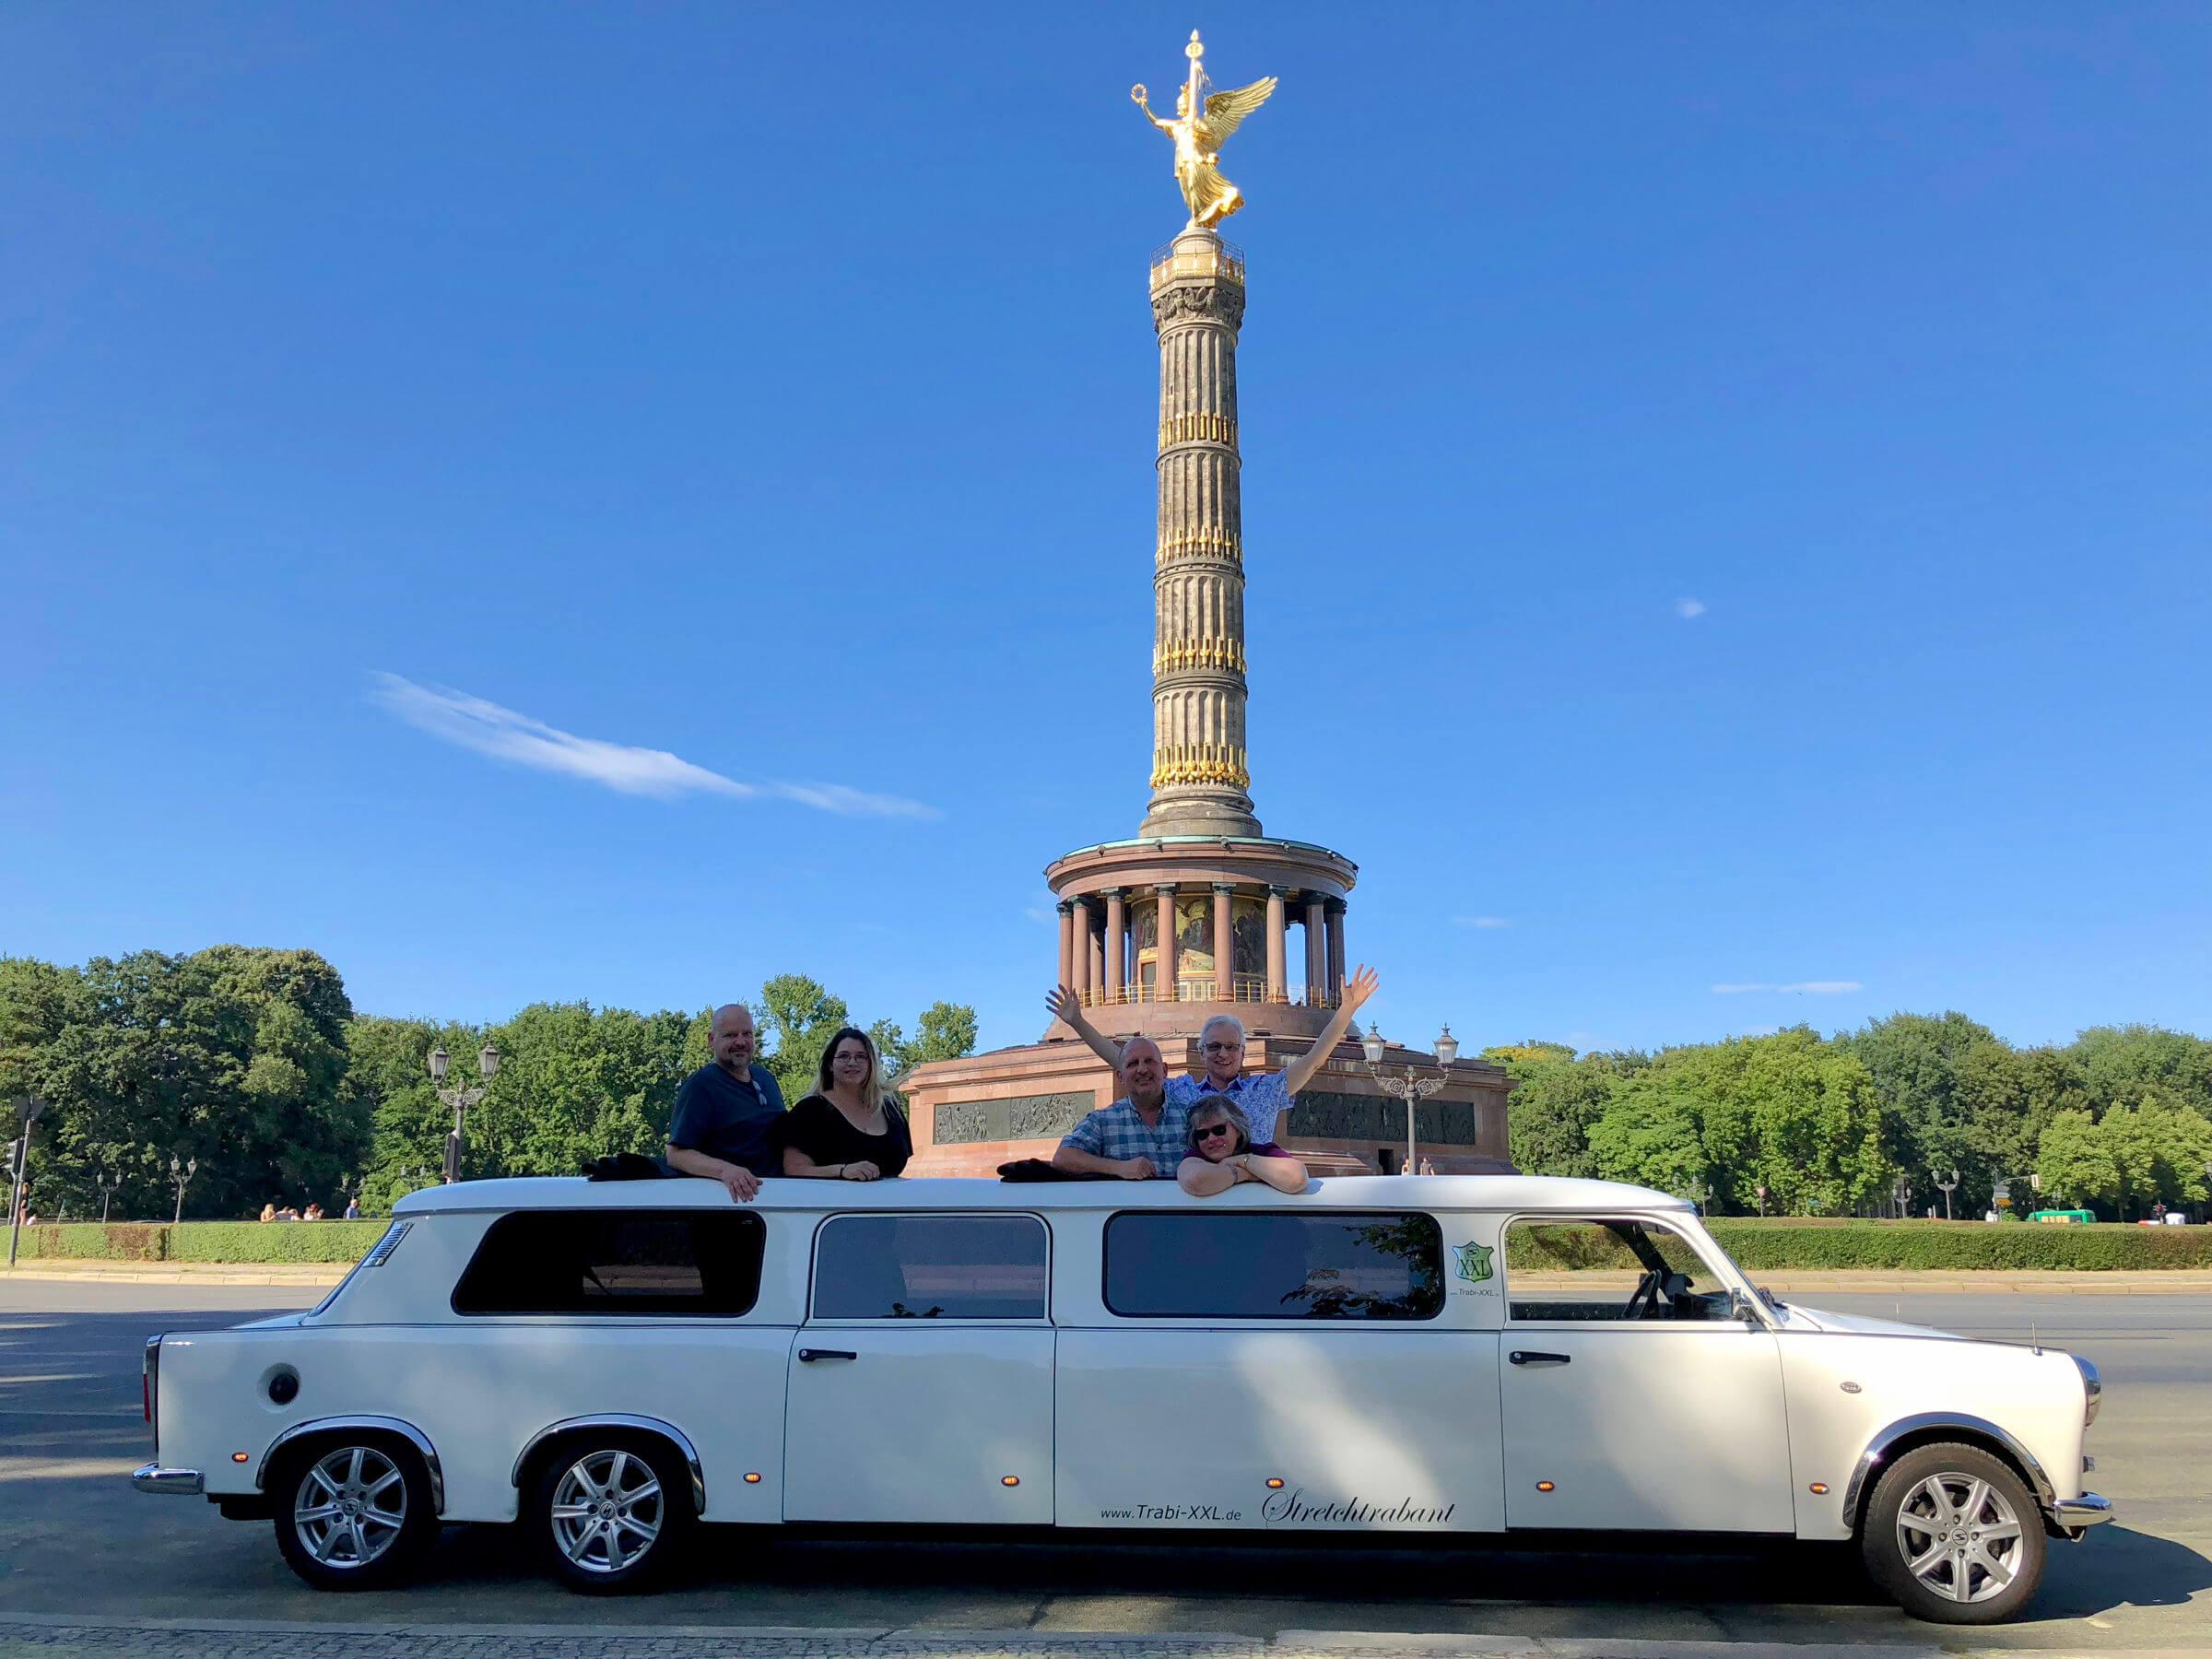 Stadtrundfahrt Trabi-XXL Berlin